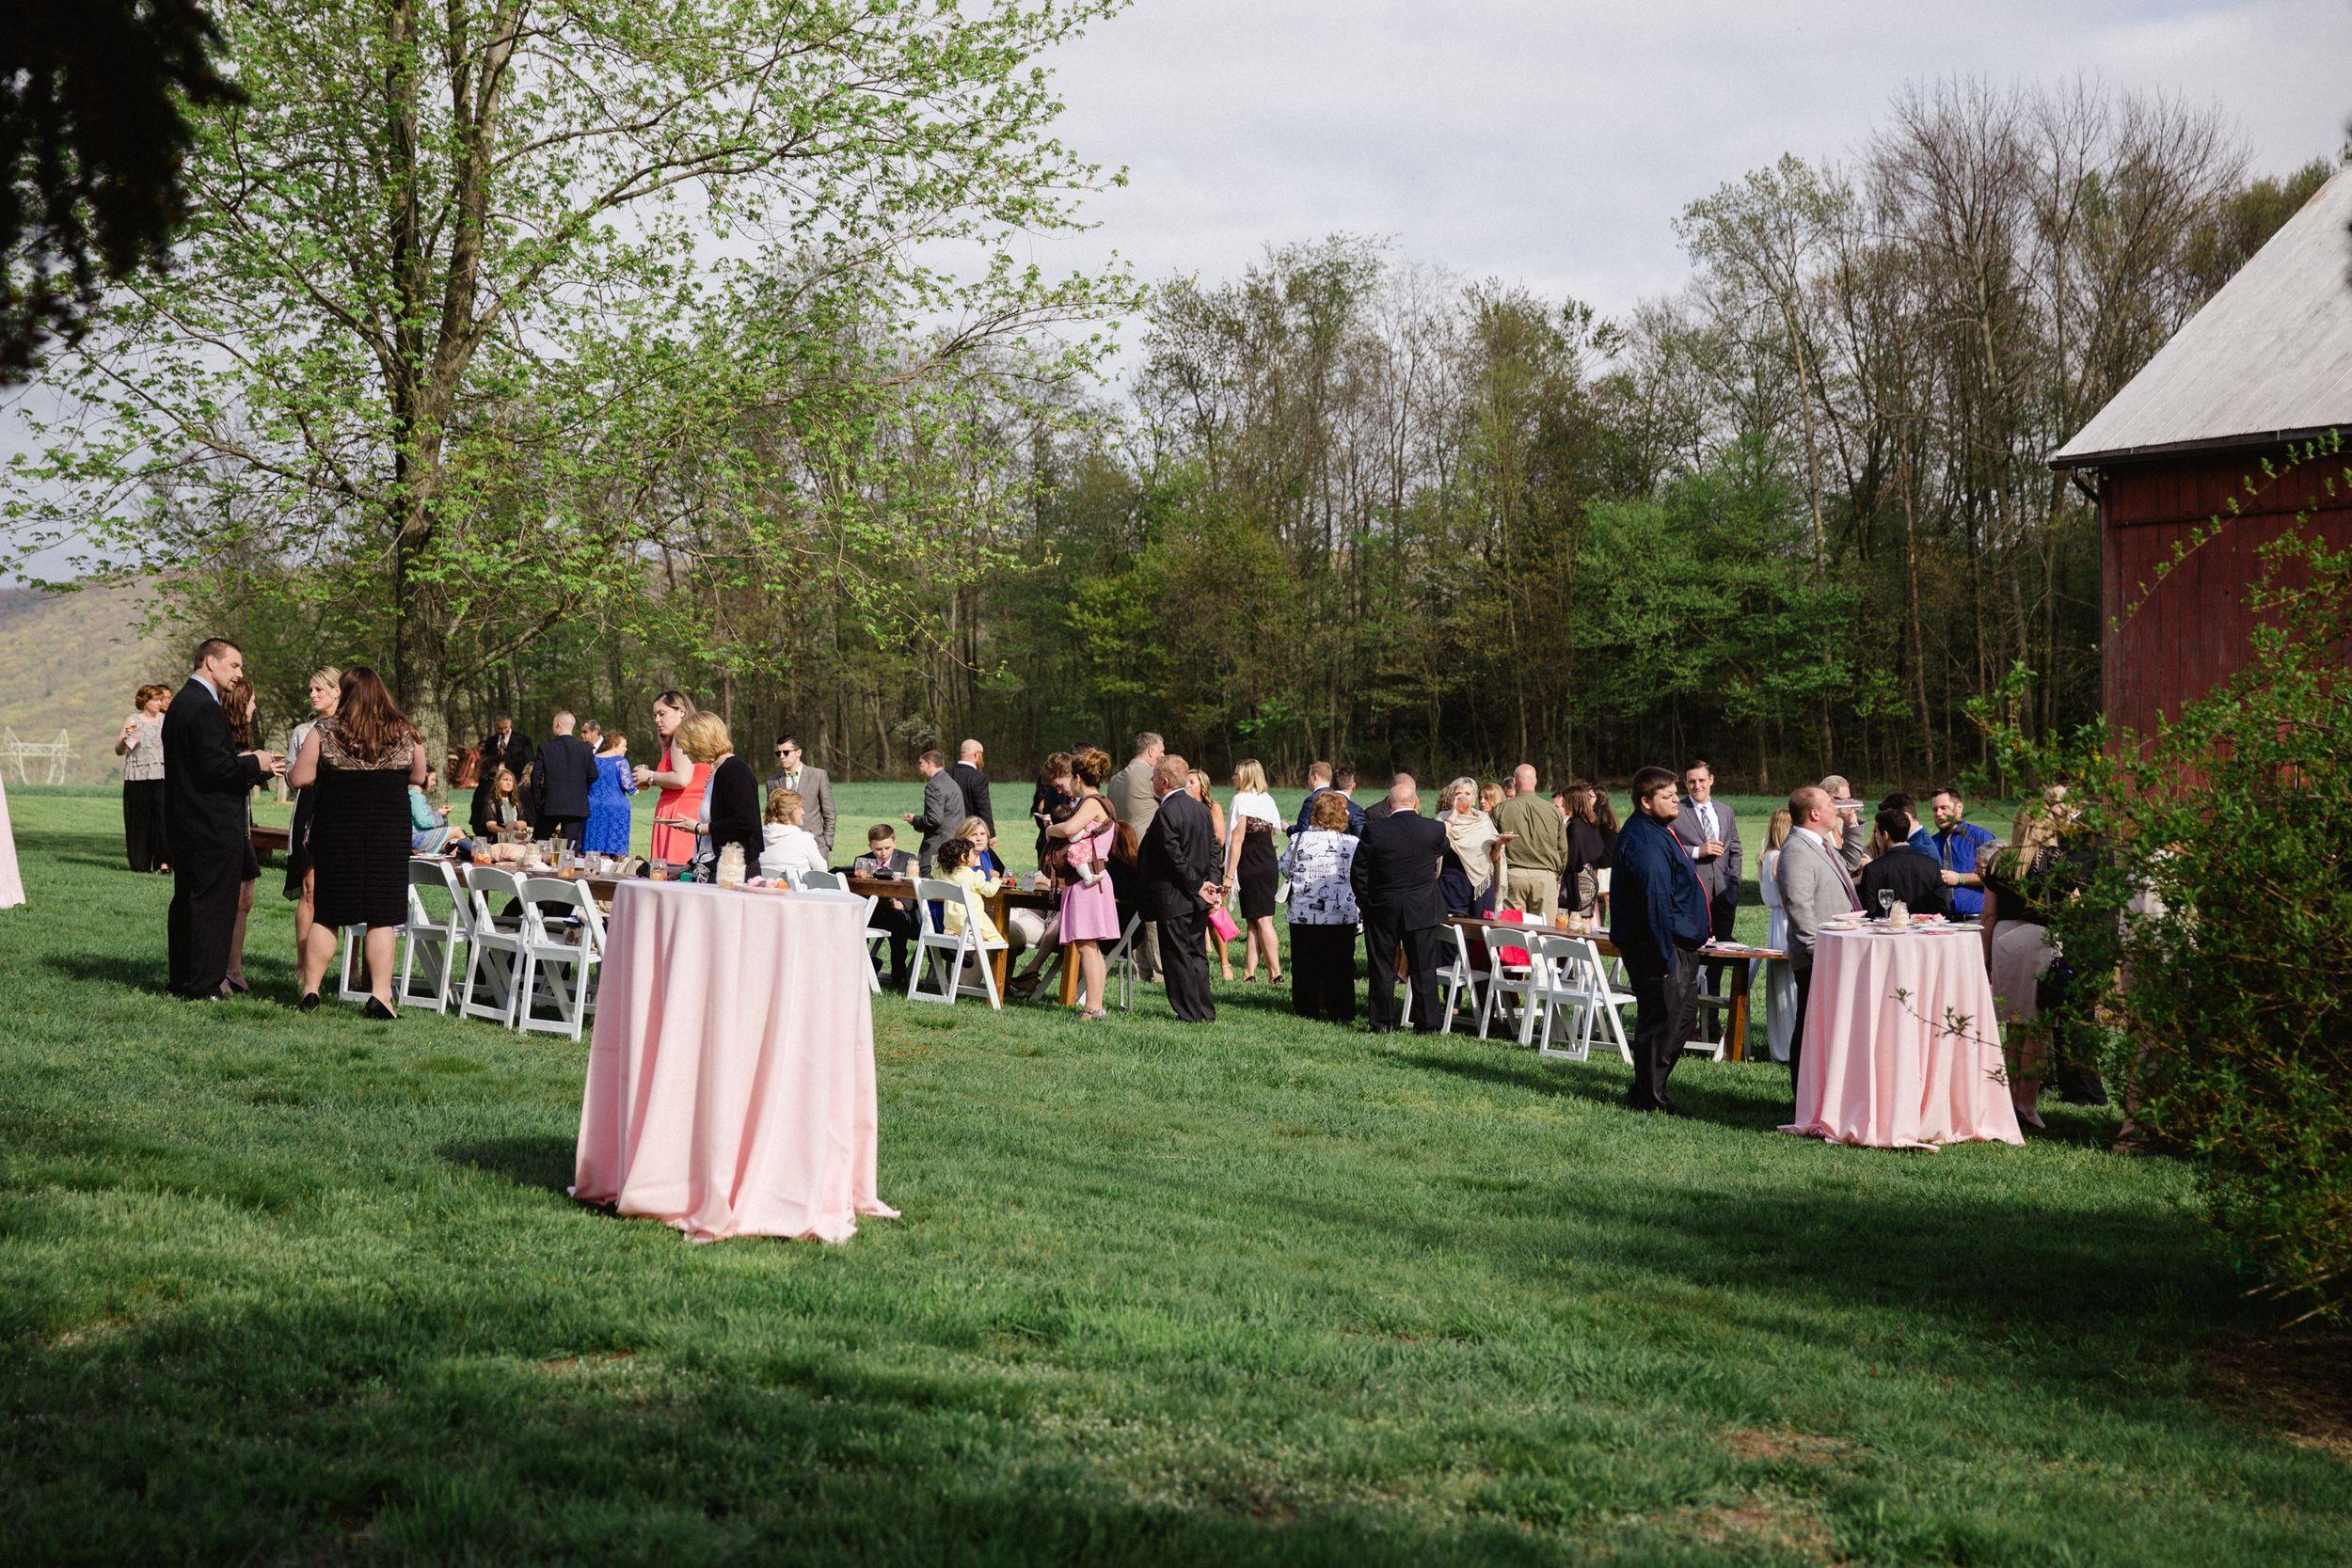 Bloomsburg Pa. Wedding The Barn at Hidden Acres. Rustic